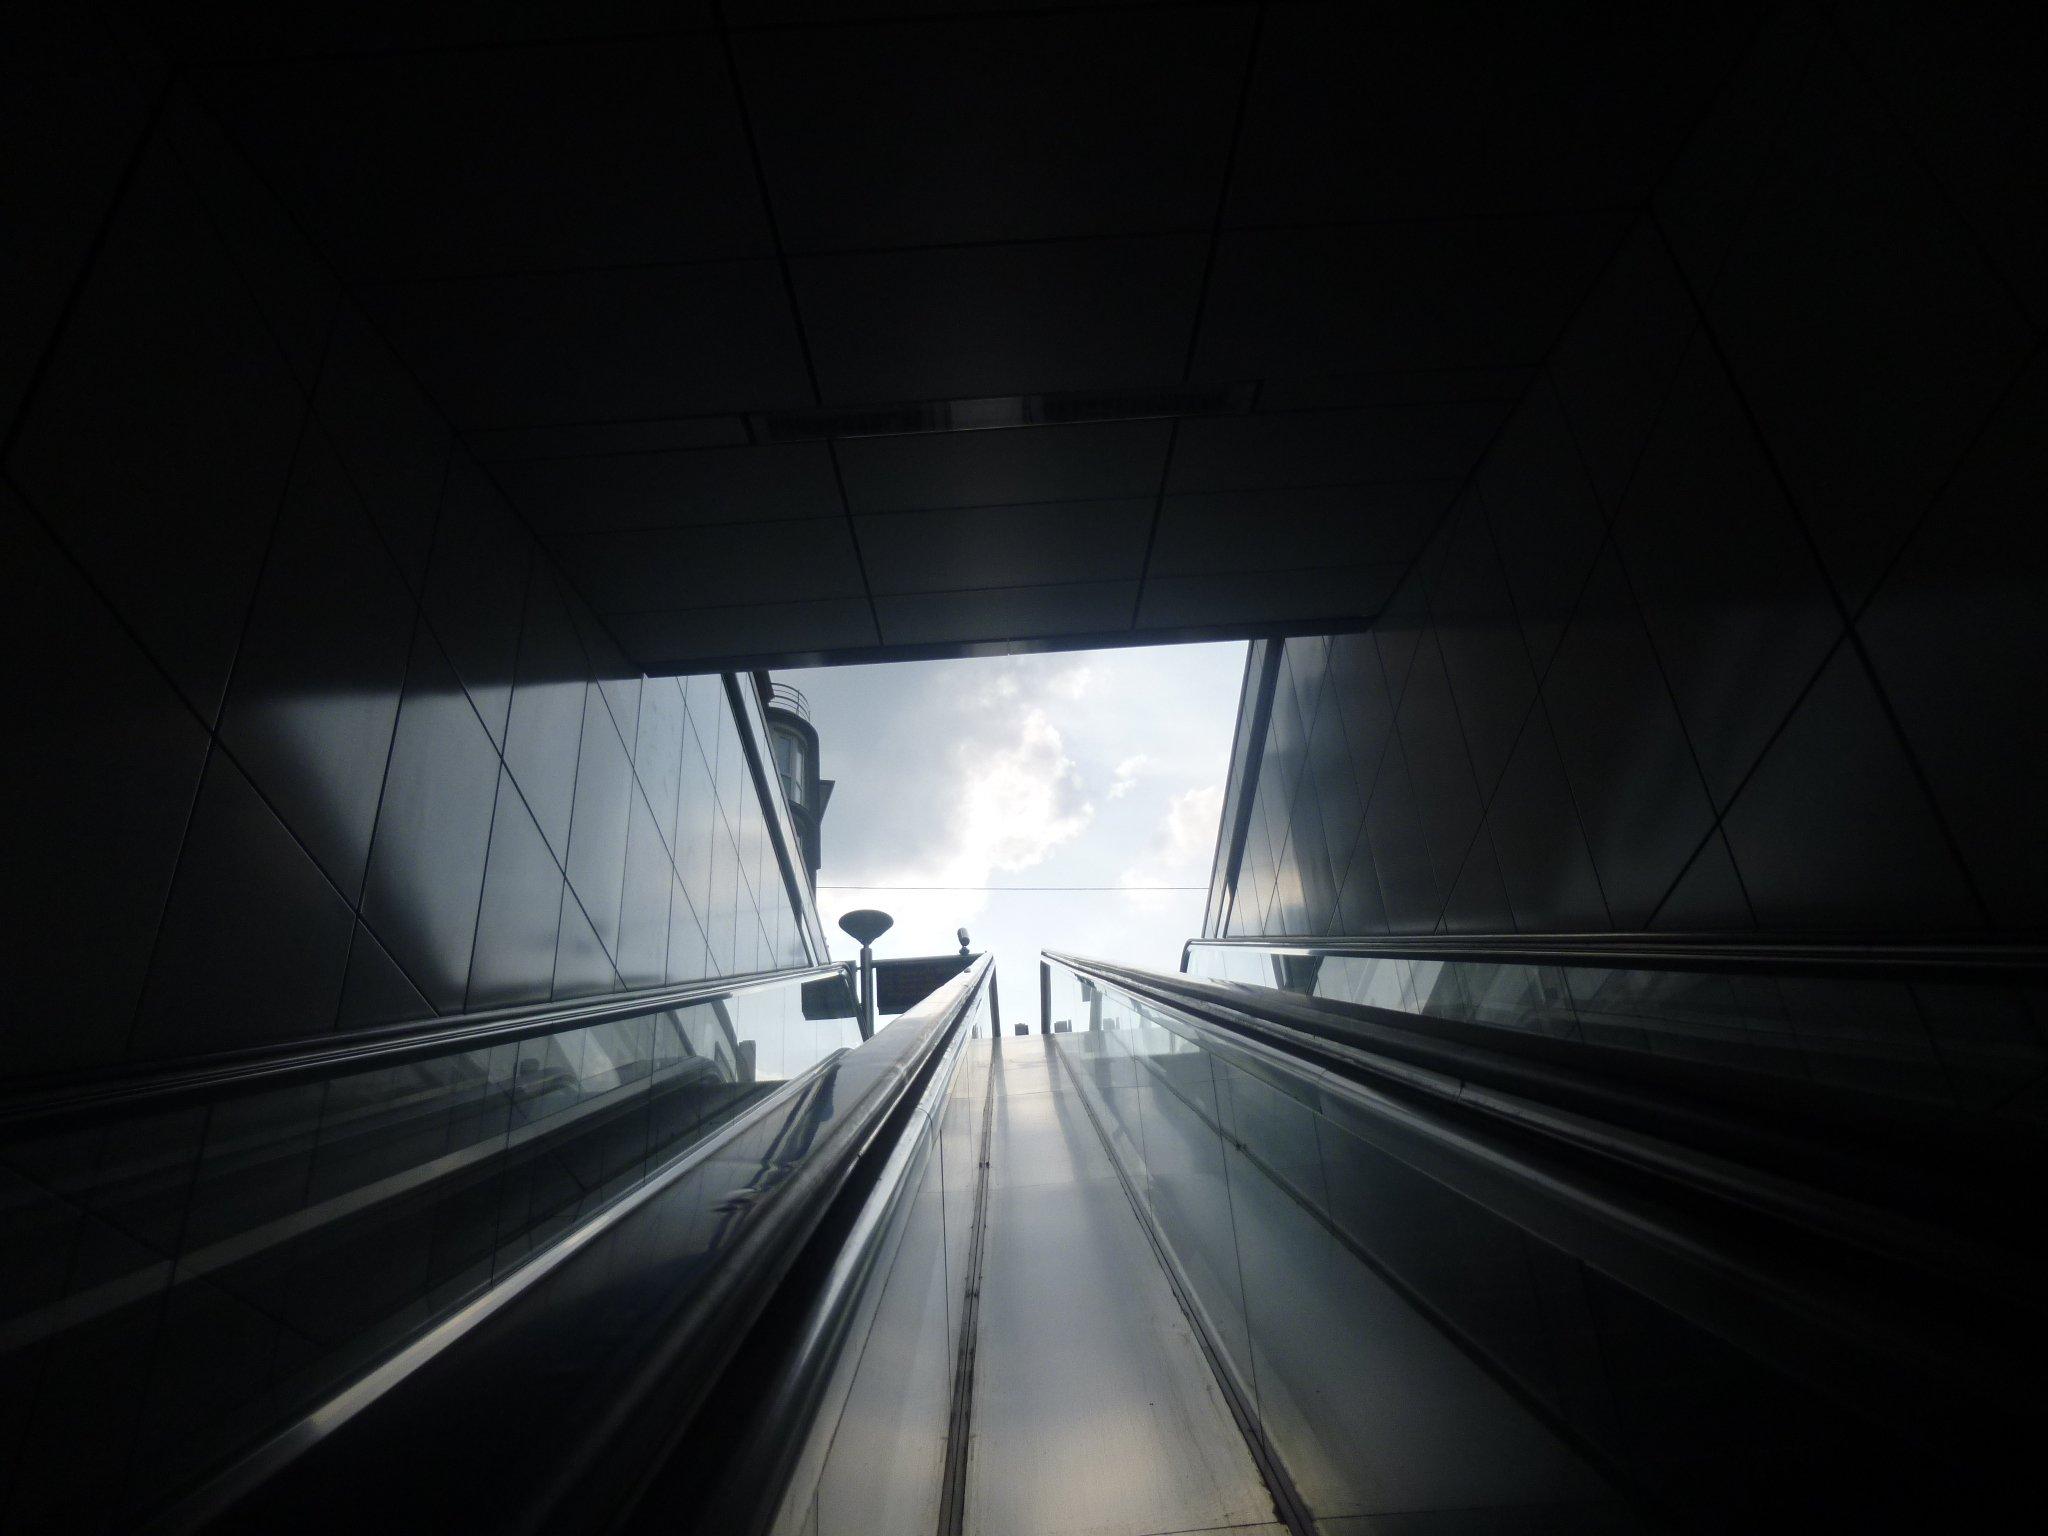 Rolltreppenfahrt